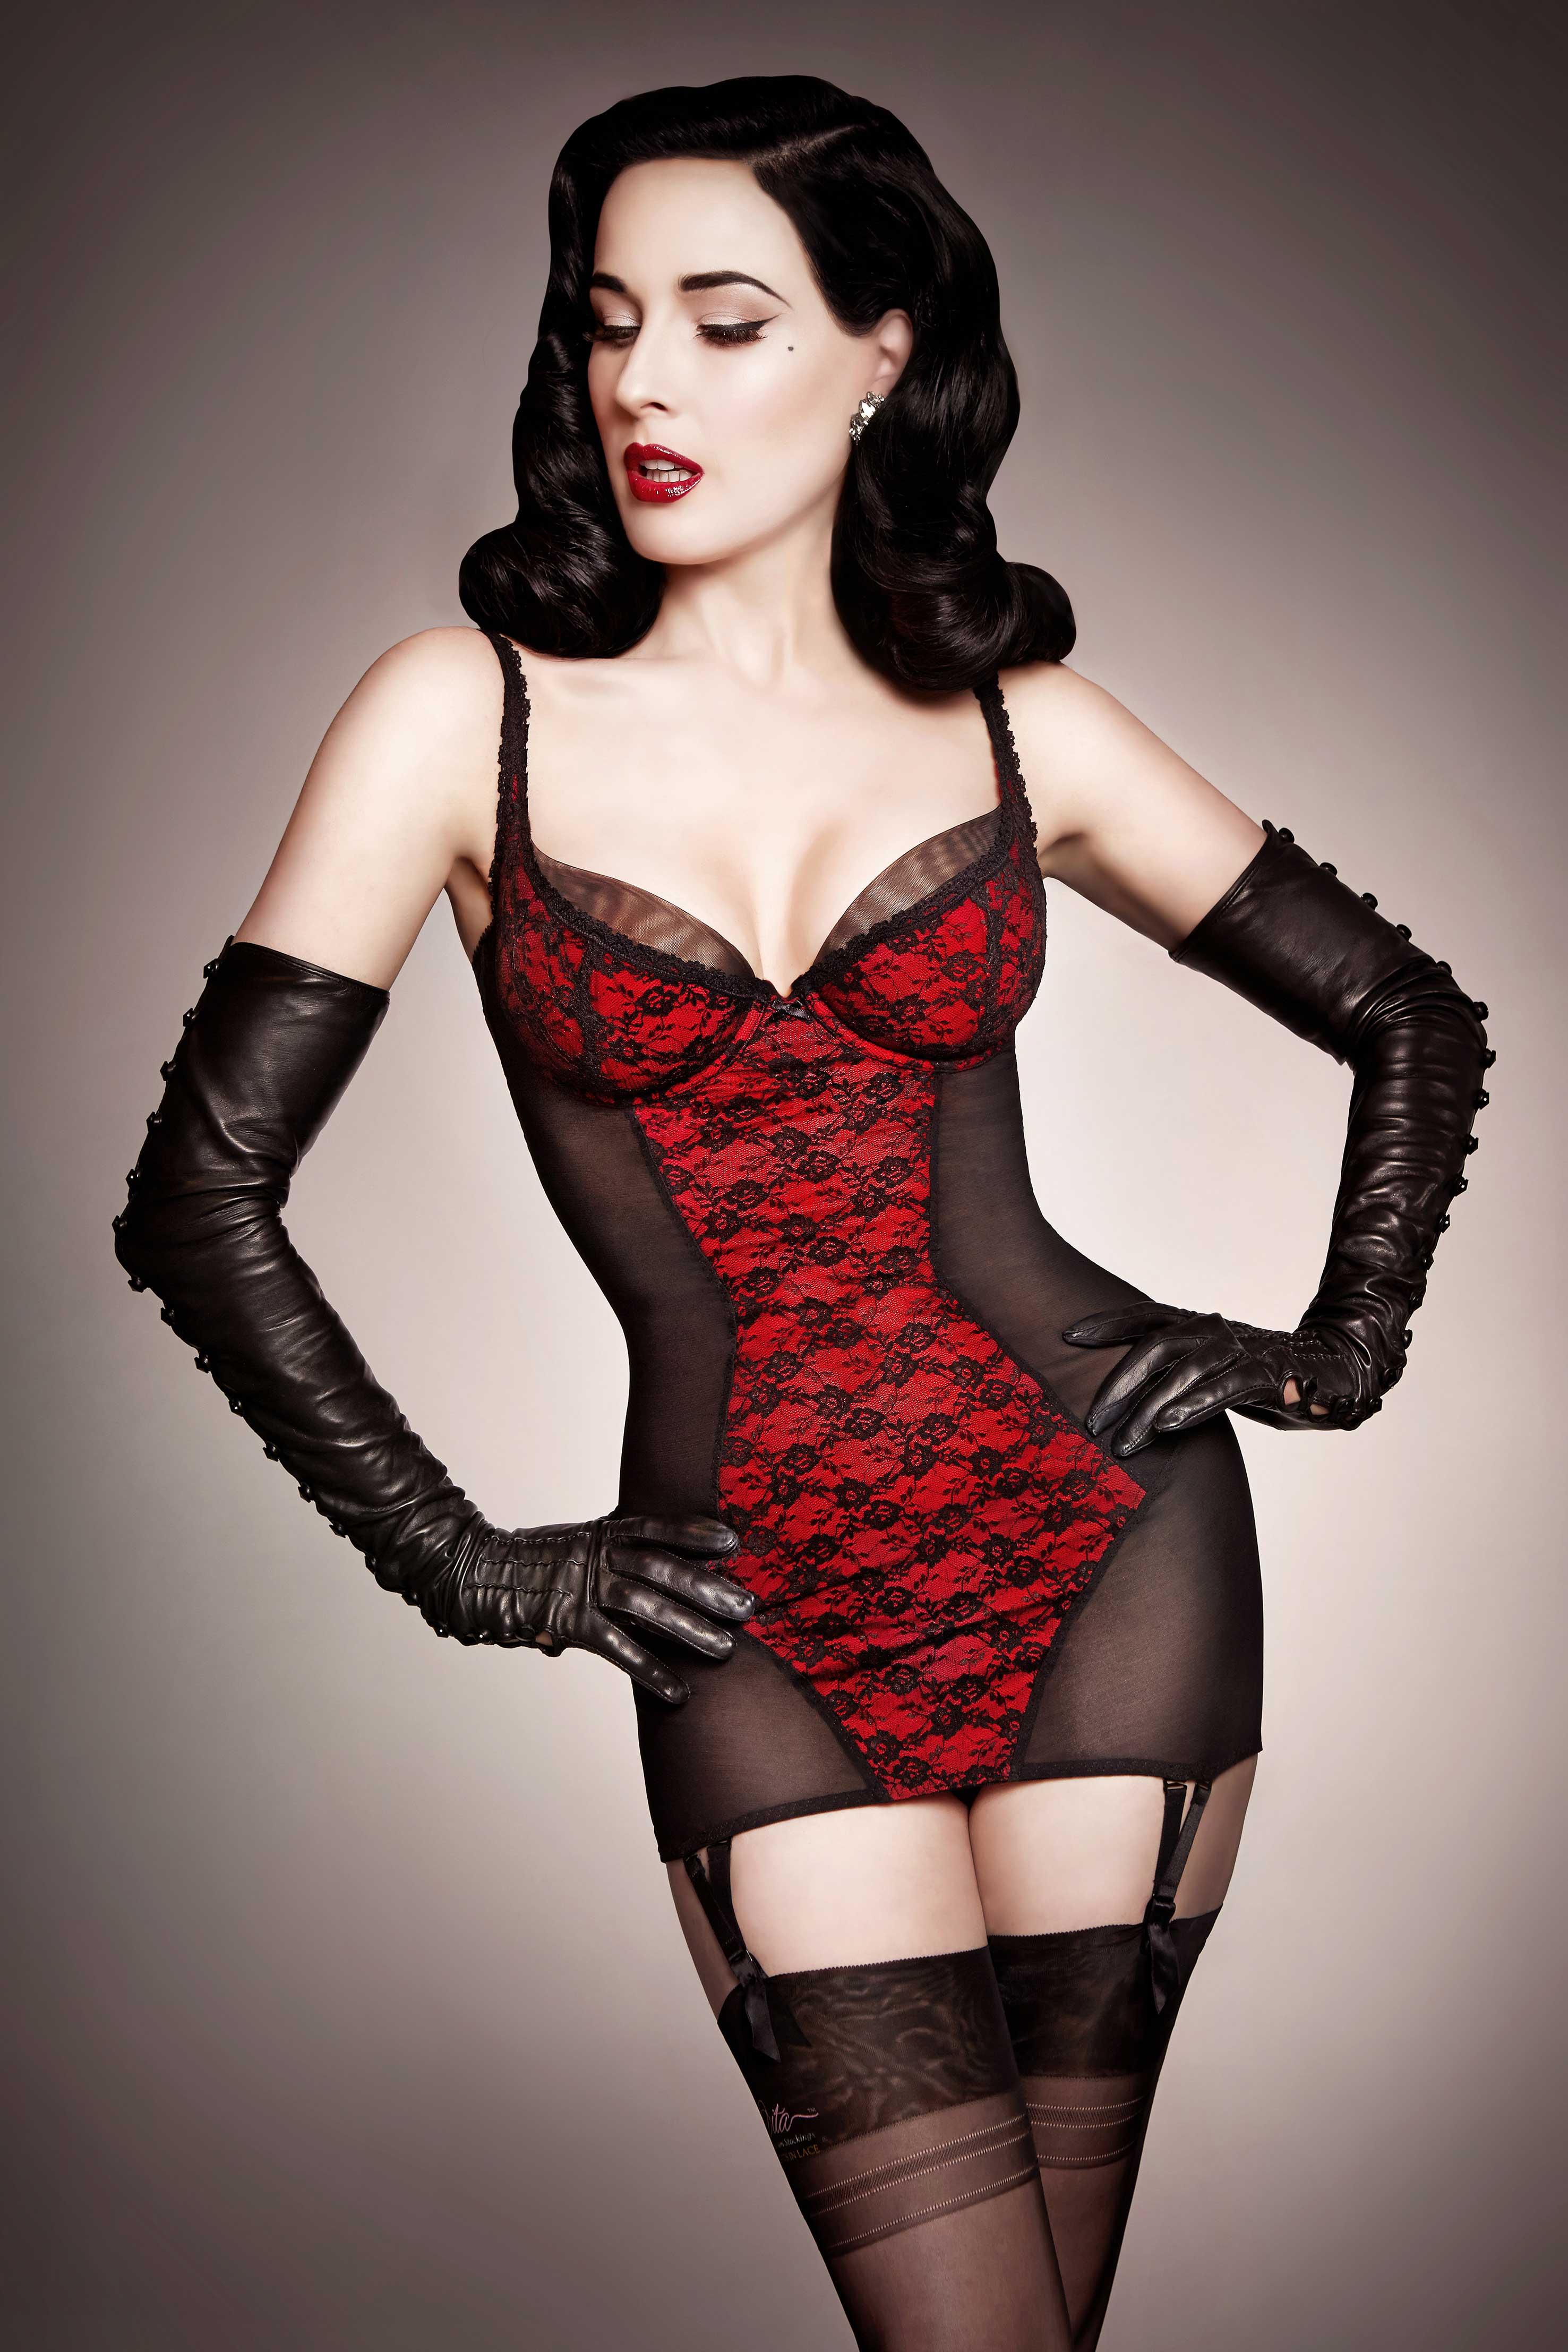 277060_Dita_Von_Teese_sheer_witchery_red_longline_corset